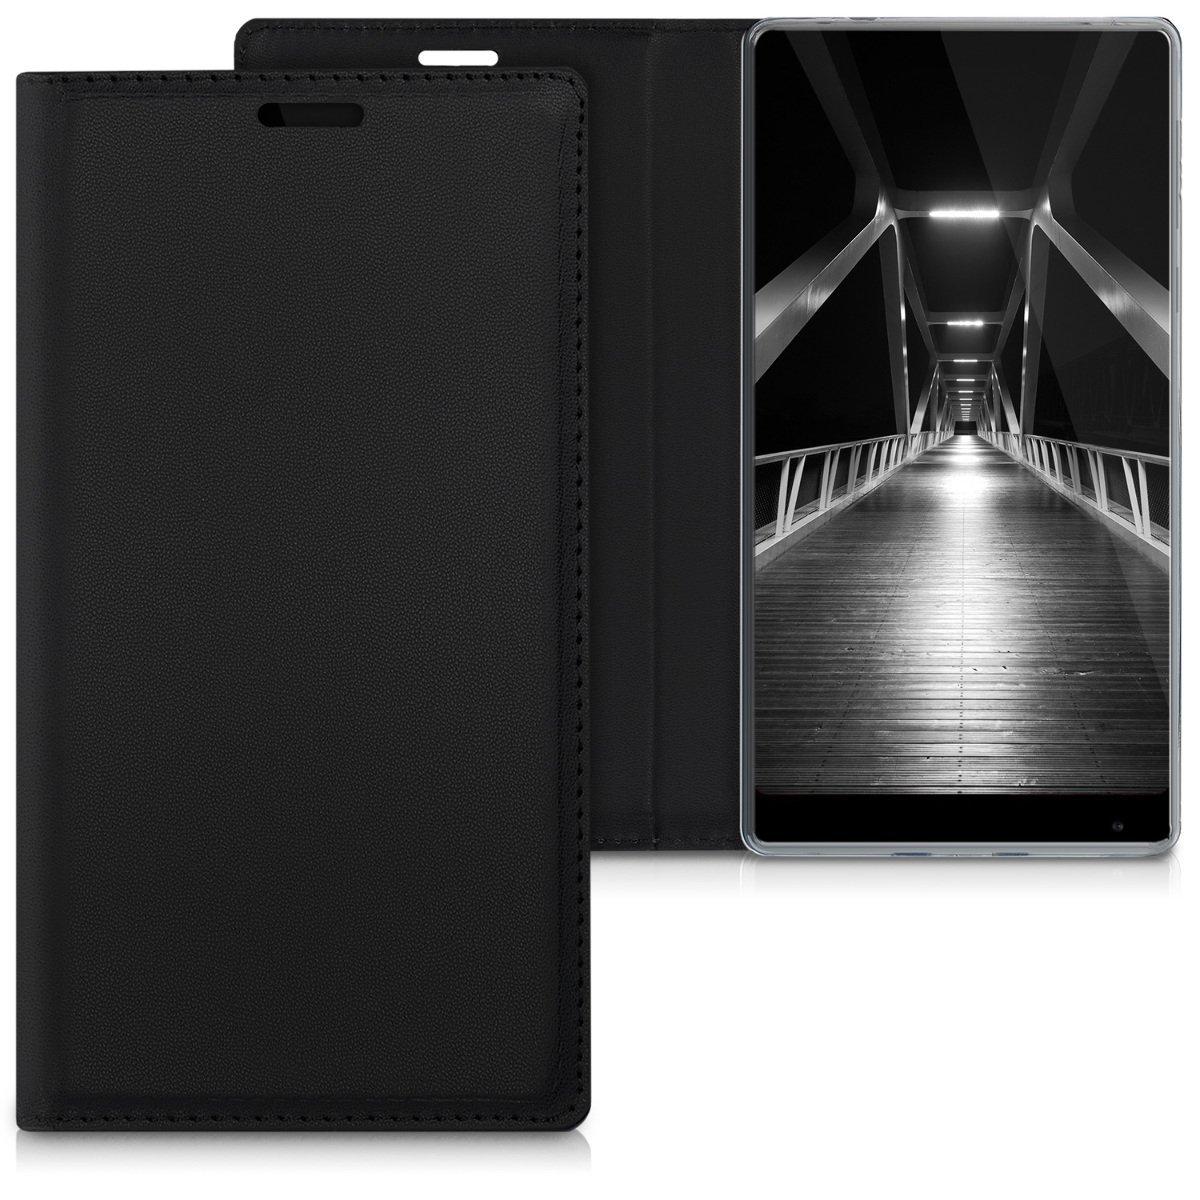 KW Θήκη - Πορτοφόλι Xiaomi Mi Mix - Black (41522.01)